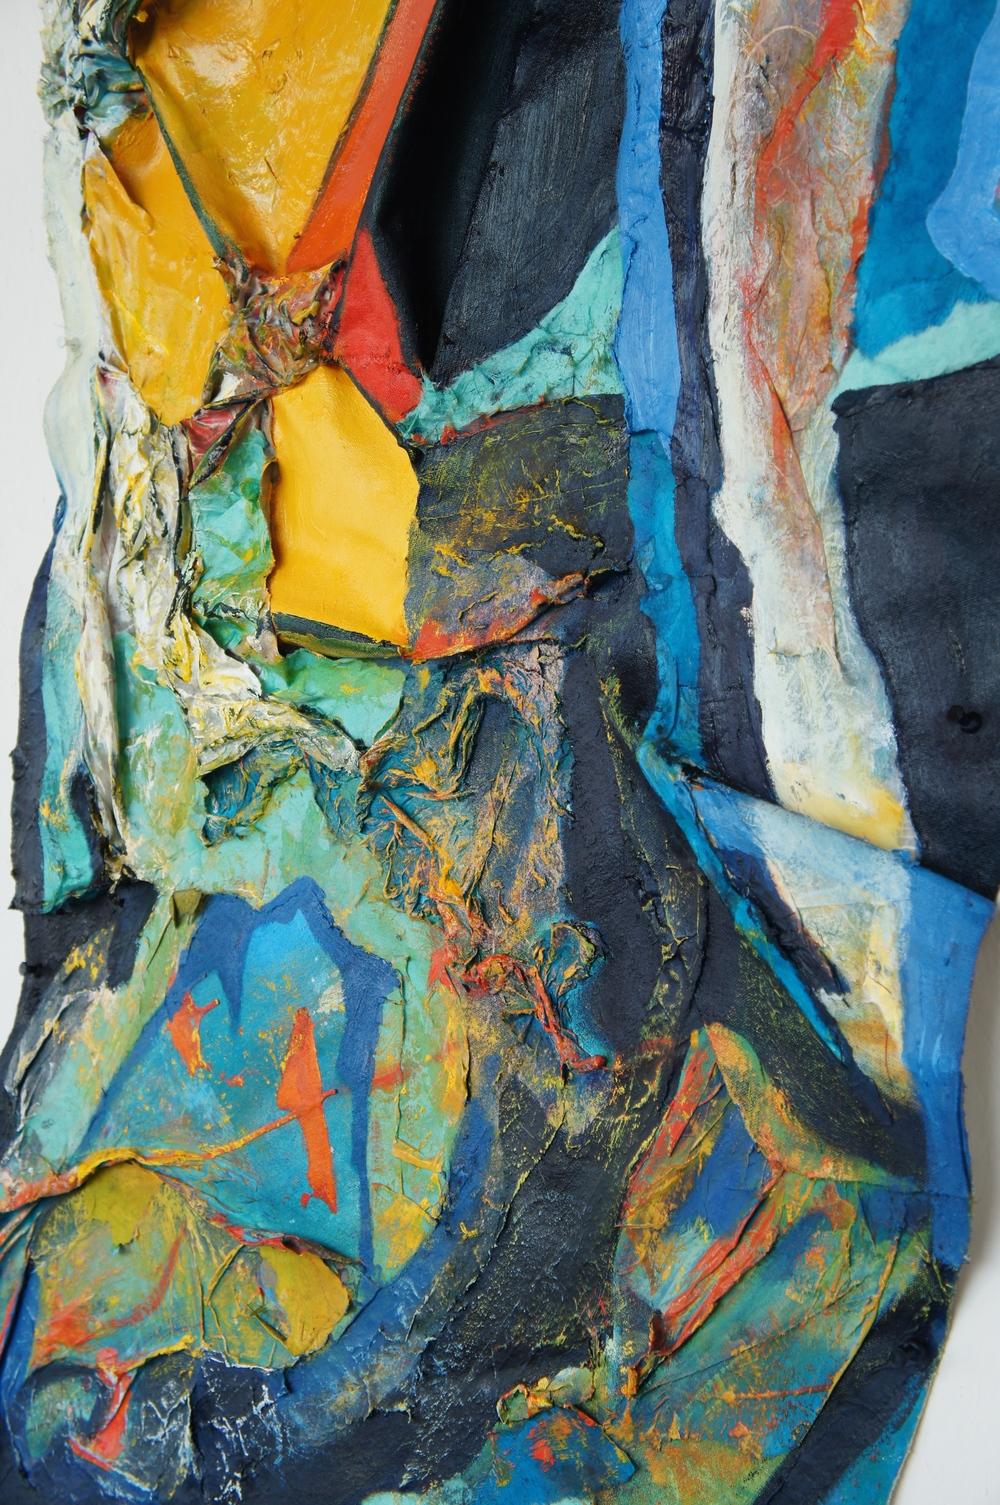 Detail, Organic Abstractions I, II and III  (photo credit: Mark Warren, 2015)